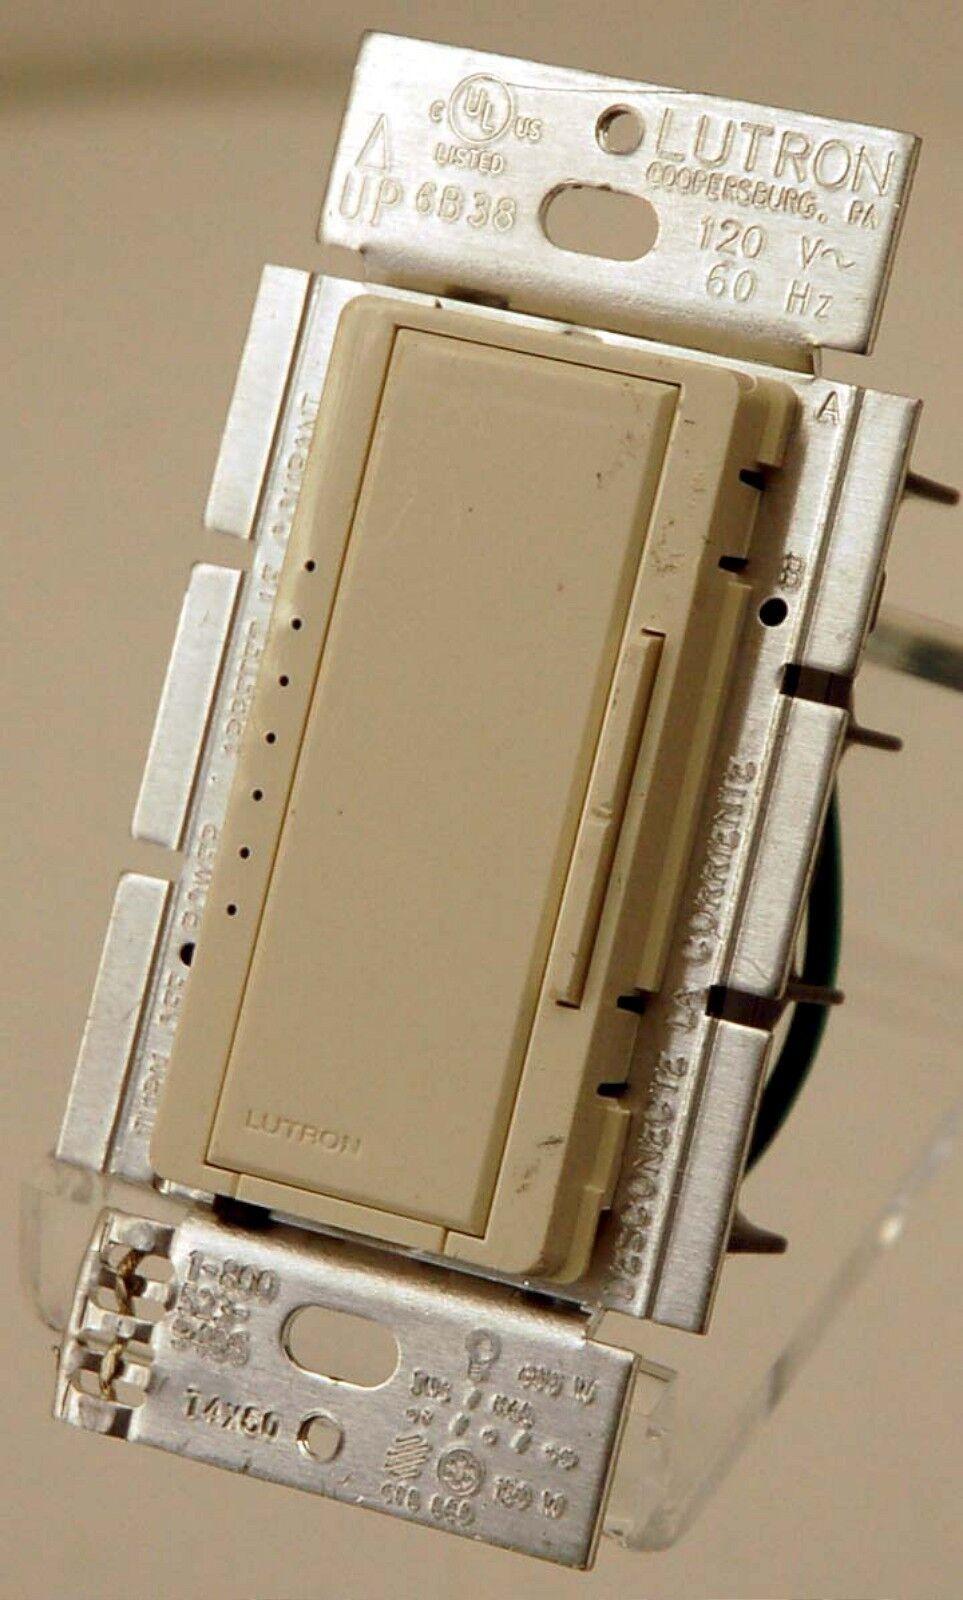 Lutron Maestro Macl 153m La Single Pole Wall Dimmer Light Switch Led Lt Almond